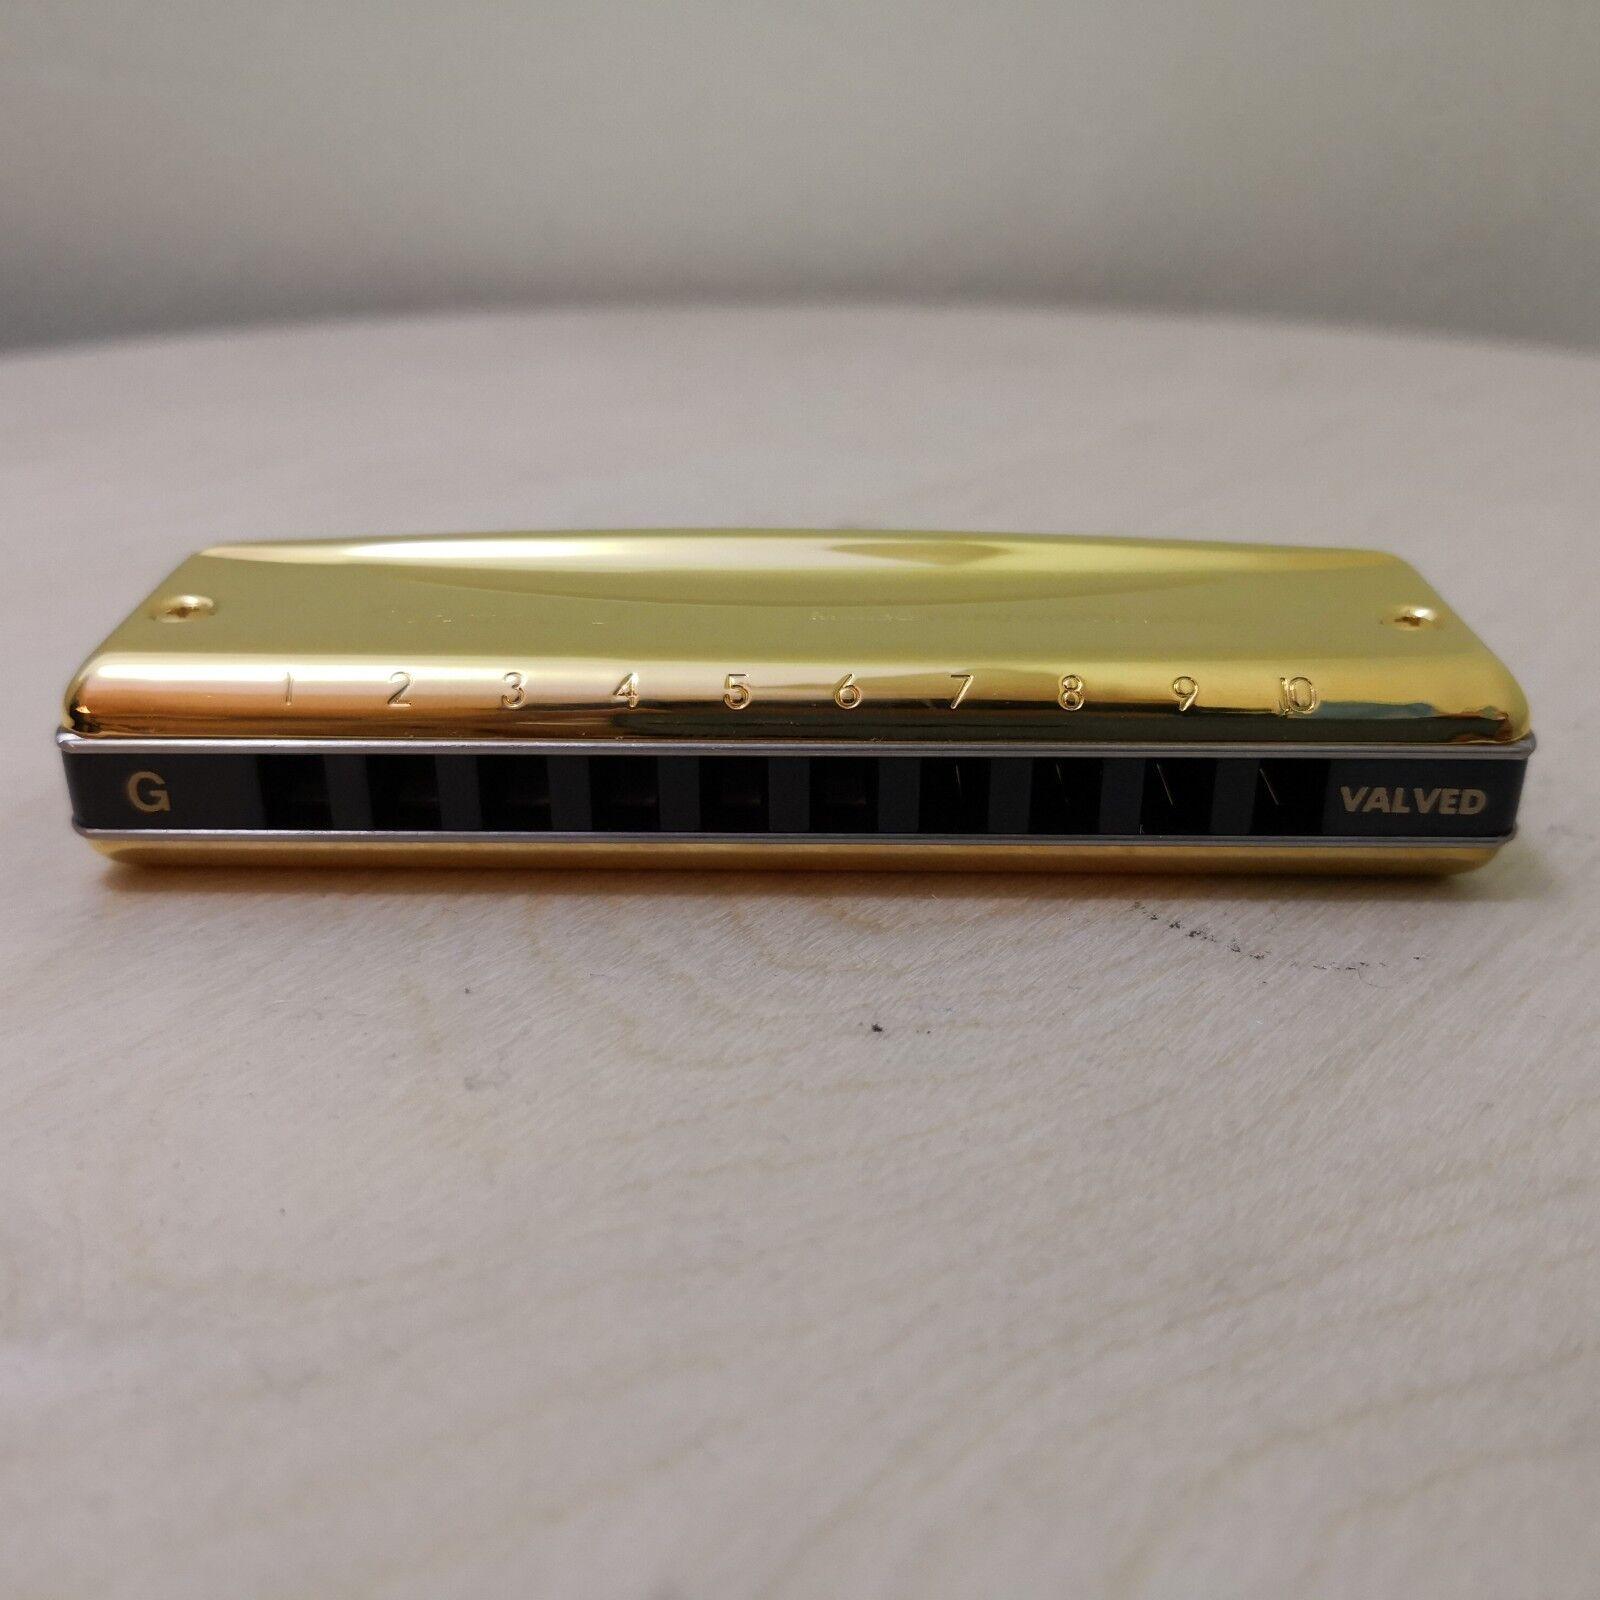 Suzuki Harmonica MR-350 GV oro Valved Promaster - G - - - 18 Karat oro - NEW  63c1f5